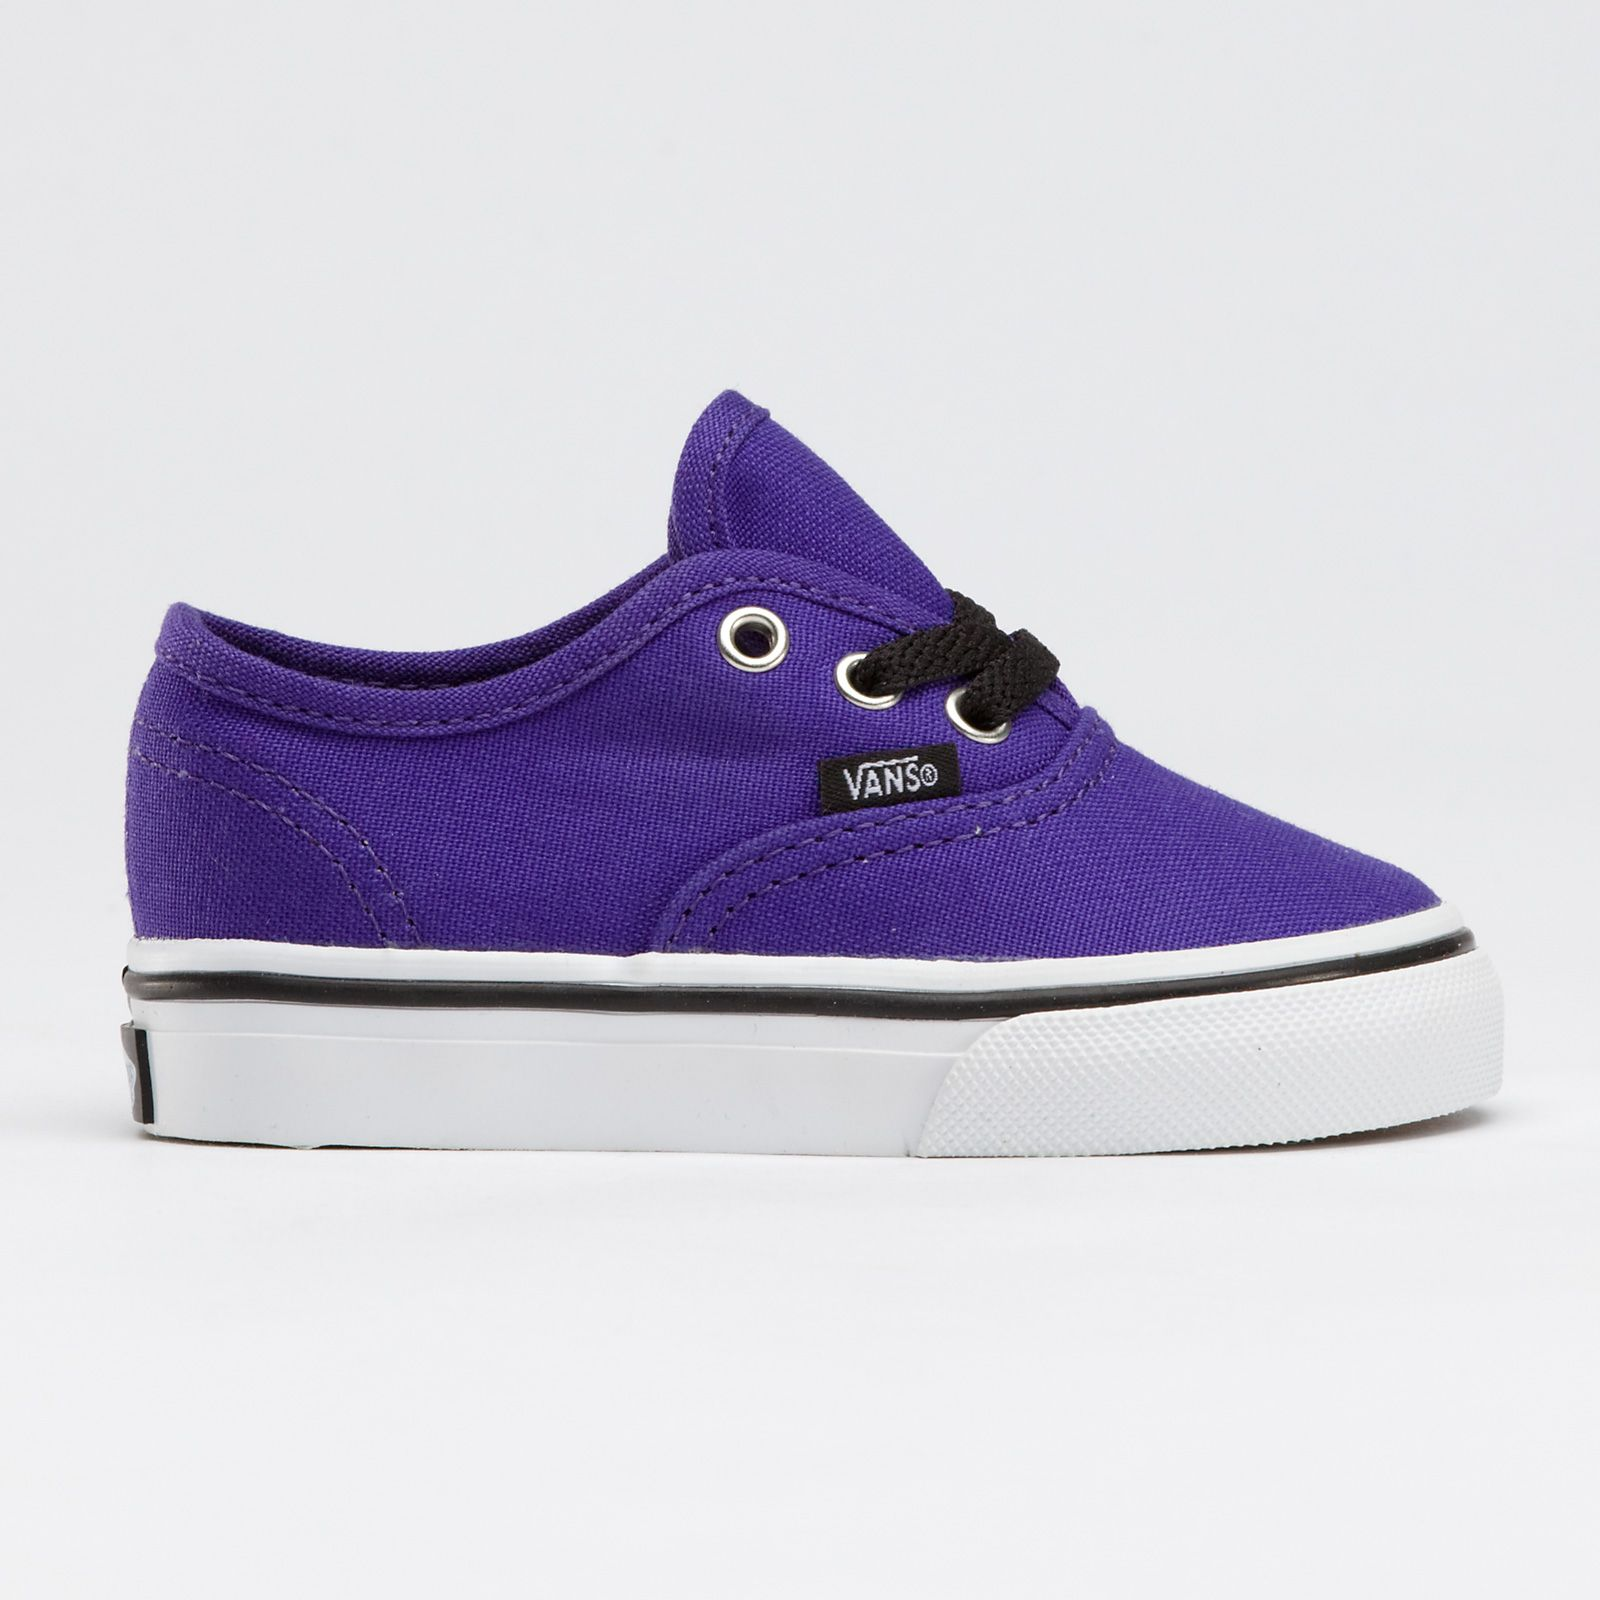 c0353f0cda ahhh purple vans. ahhh purple vans Toddler Shoes